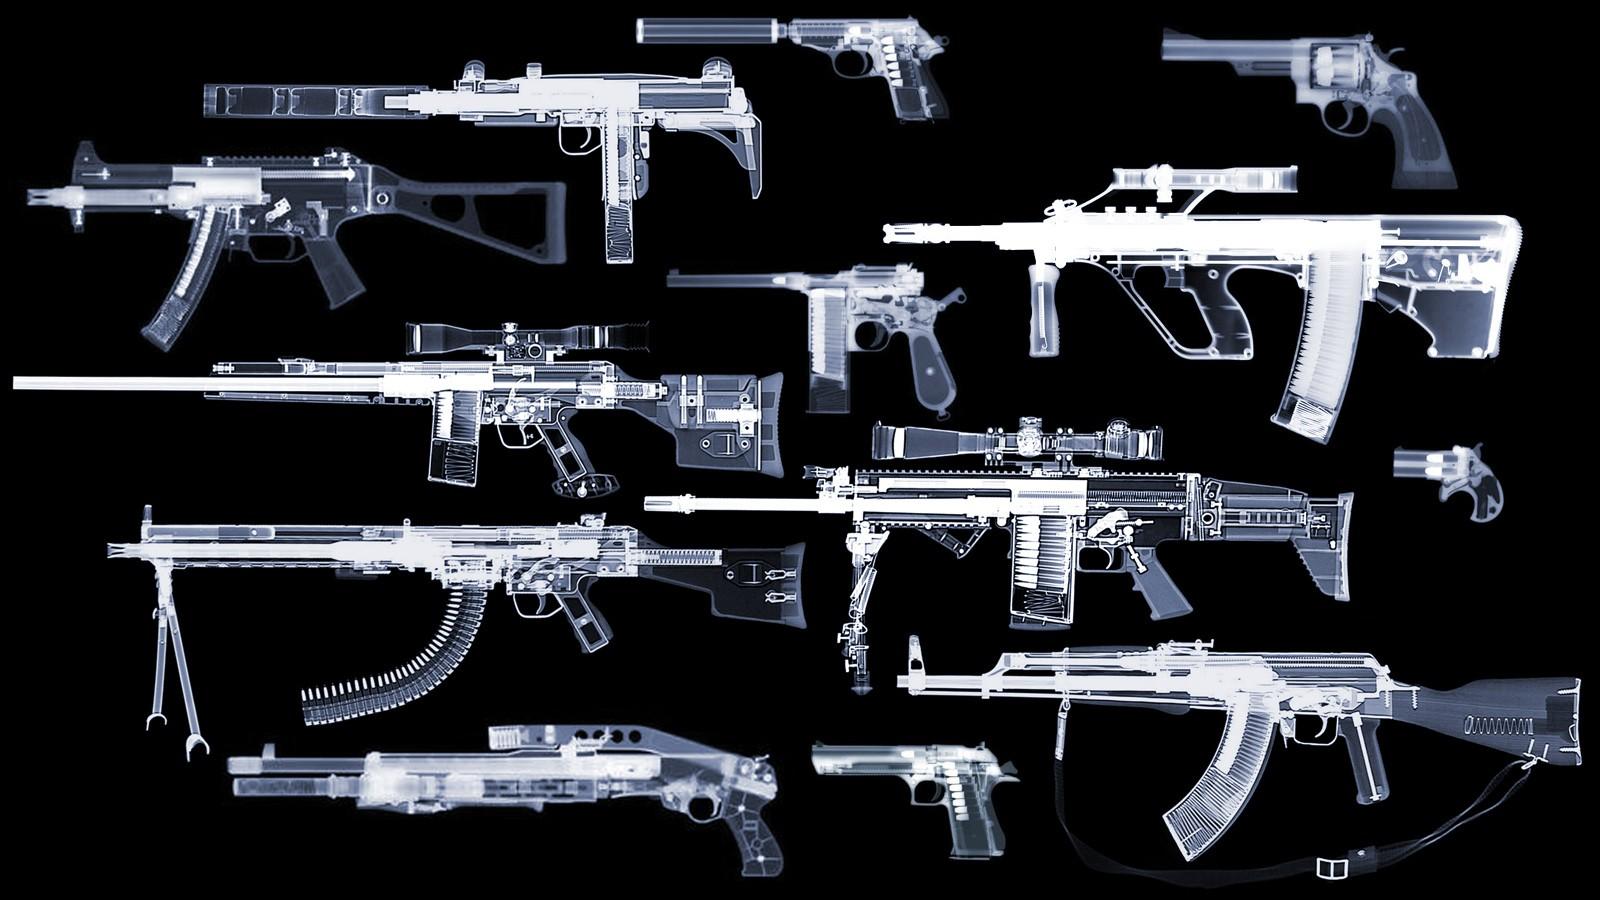 General 1600x900 x-rays gun rifles pistol Steyr AUG  uzi HK UMP AKM FN SCAR-H Mauser C96 Heckler & Koch Desert Eagle Walther PPK Smith & Wesson Remington spas-12